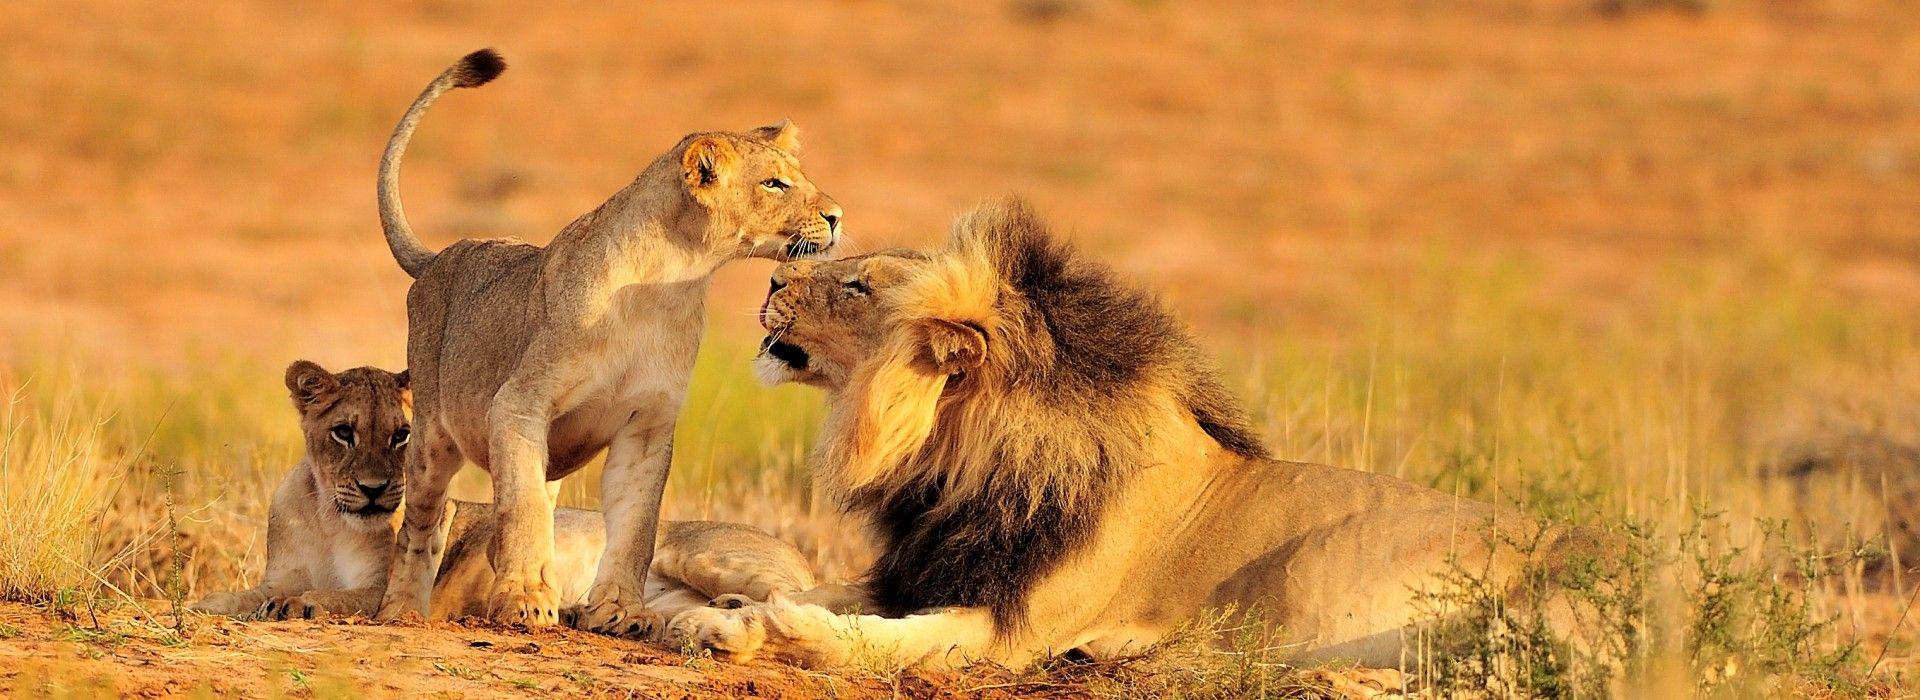 Adventure Tours in Kruger National Park